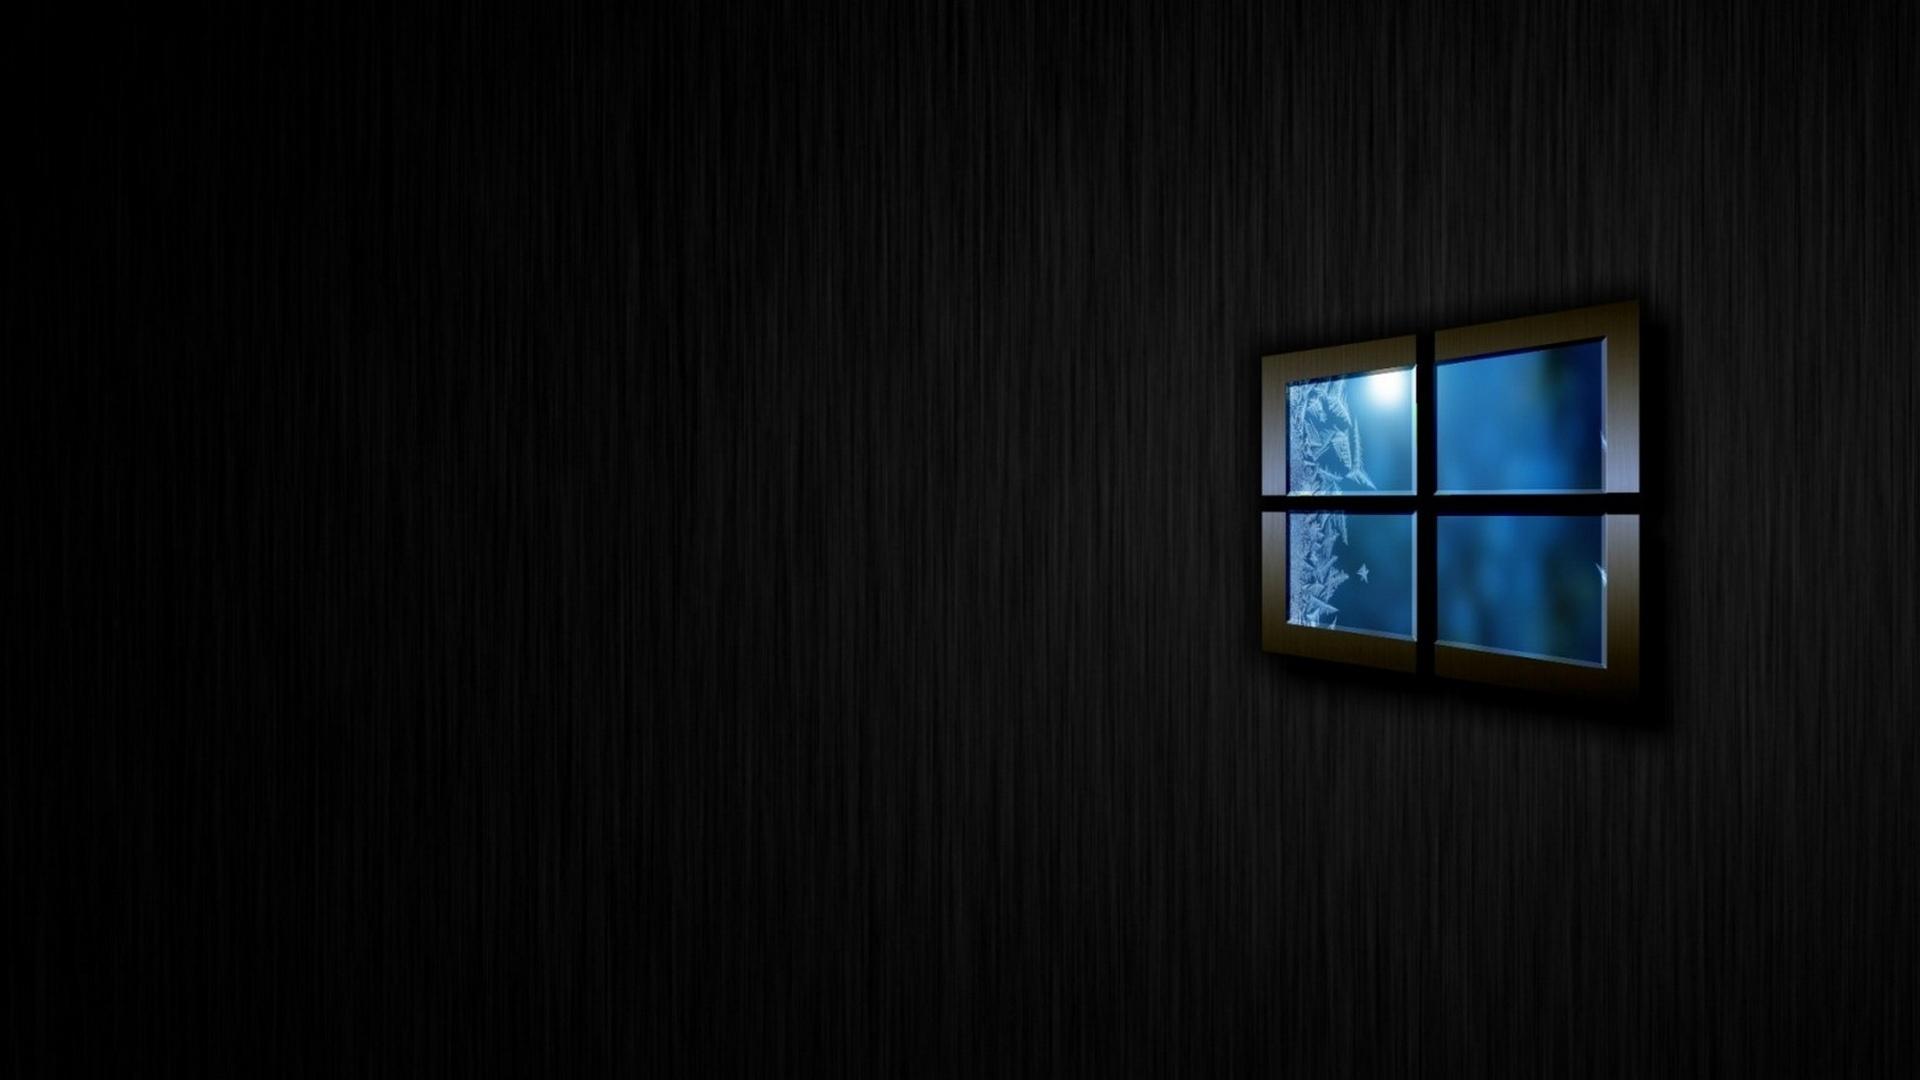 windows,  microsoft, anniversary, update, кот  № 1182216 бесплатно